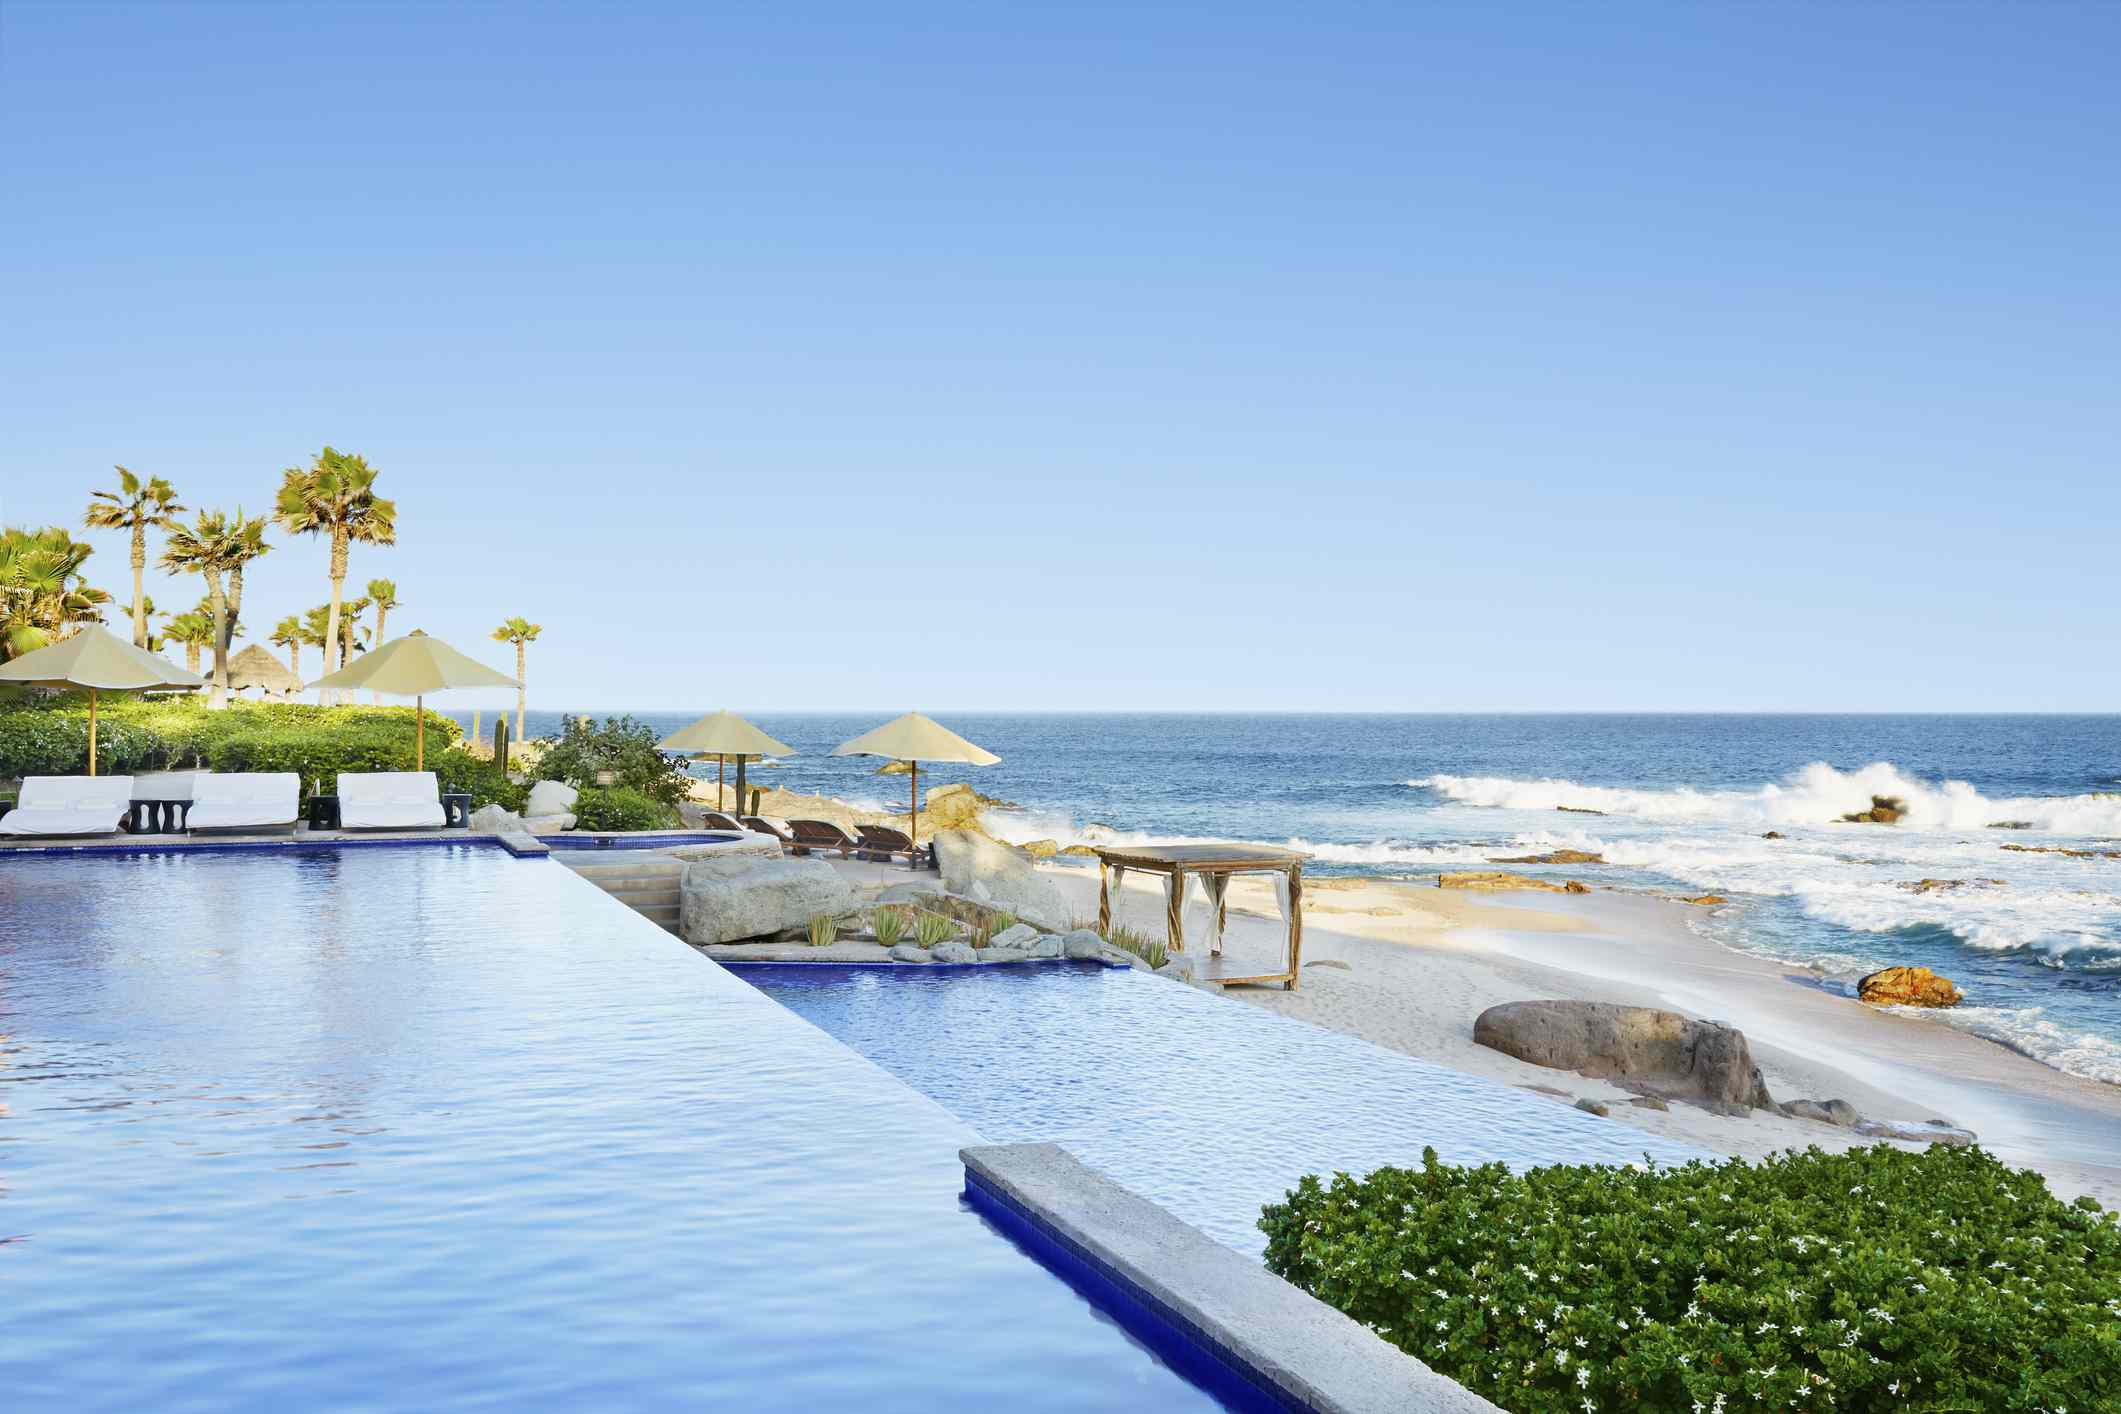 Infinity pool overlooking ocean, Cabo San Lucas, BCS, Mexico